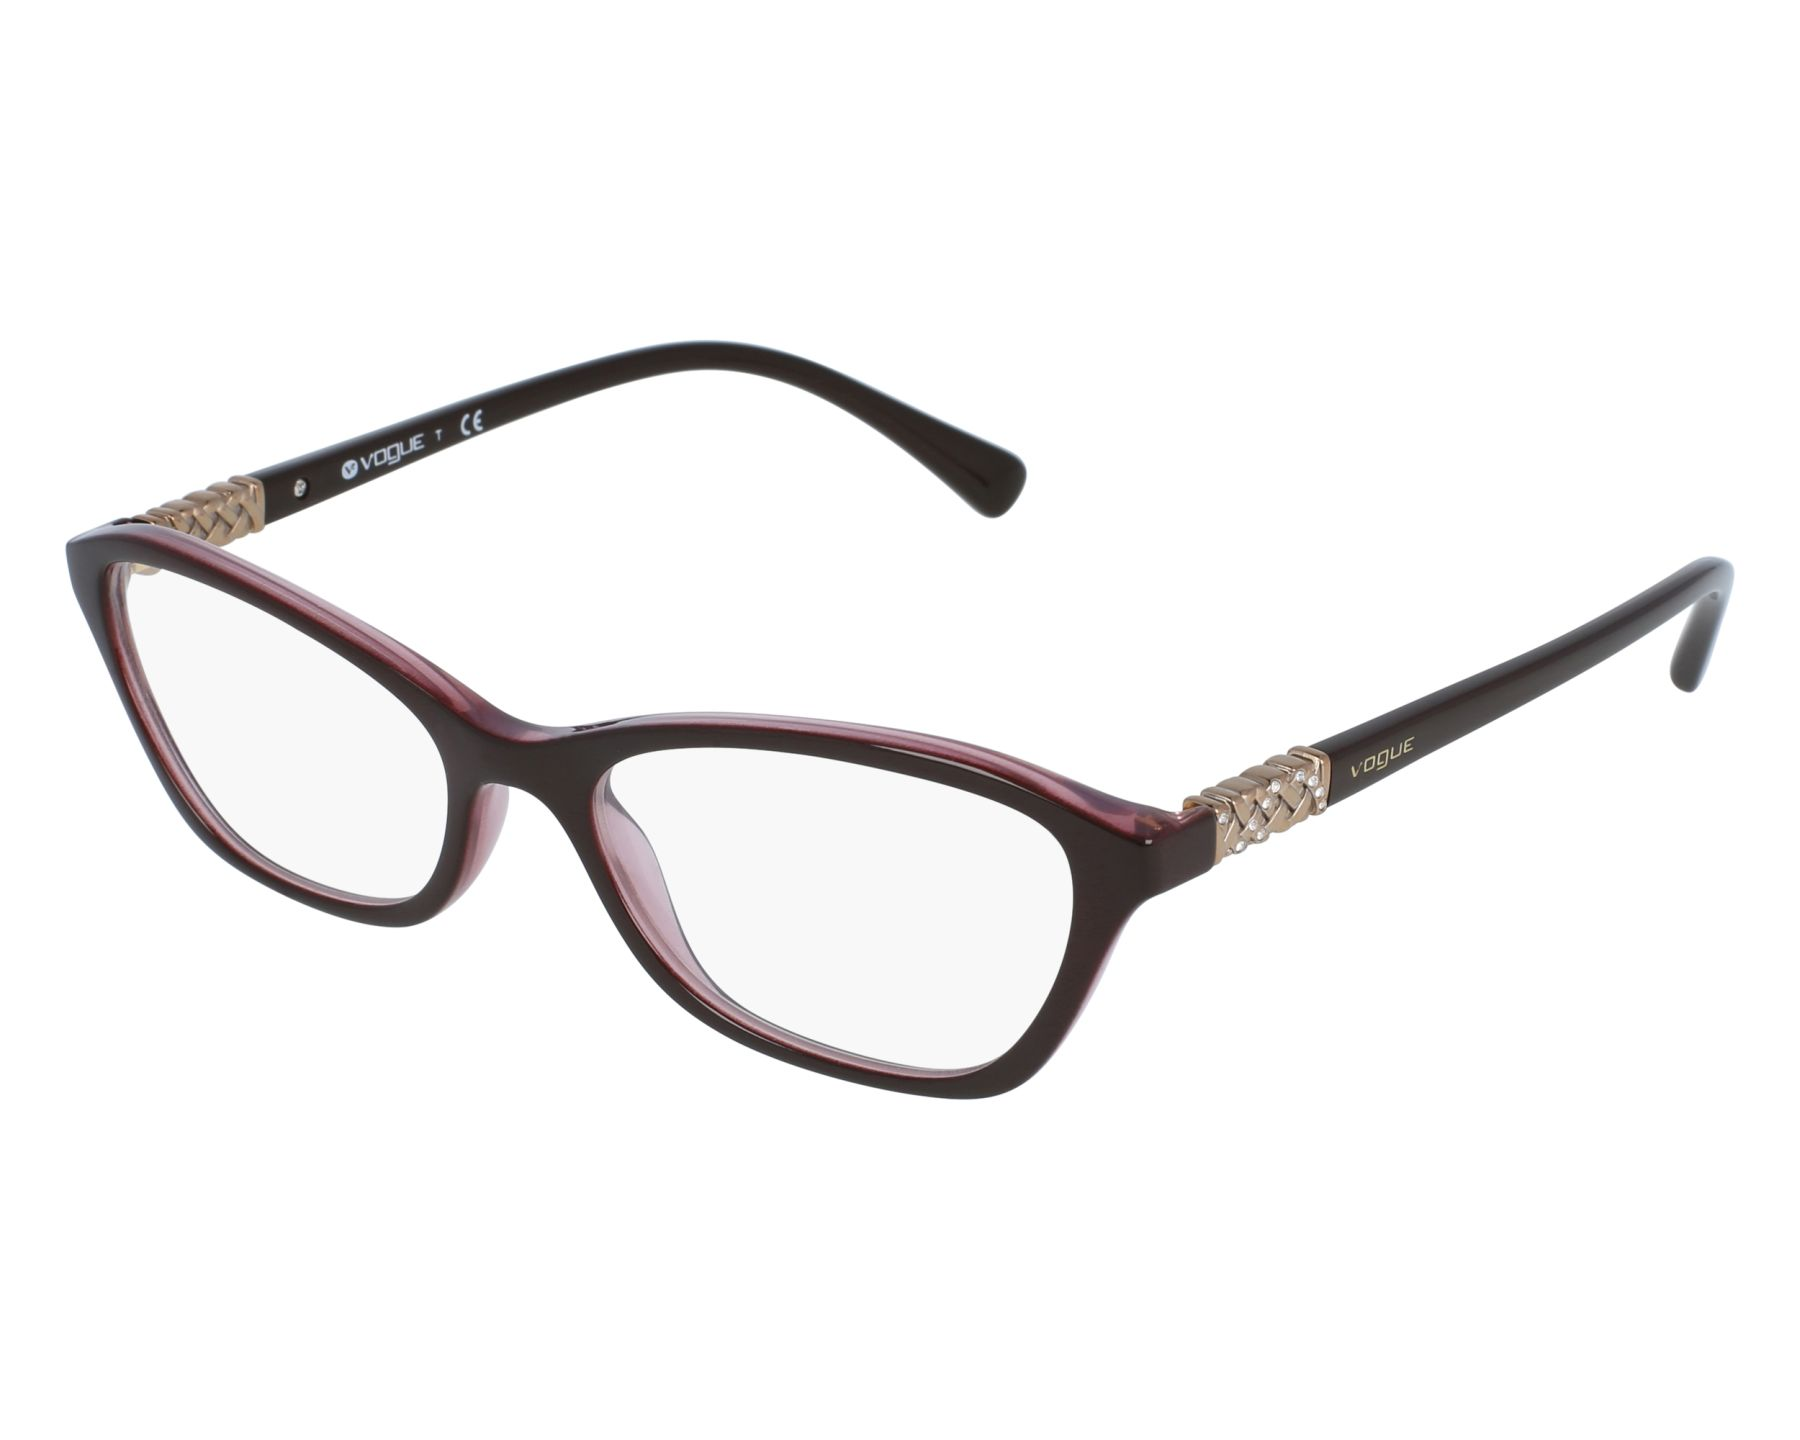 Buy Vogue Eyeglasses VO-5139-B 1941 Online - Visionet UK